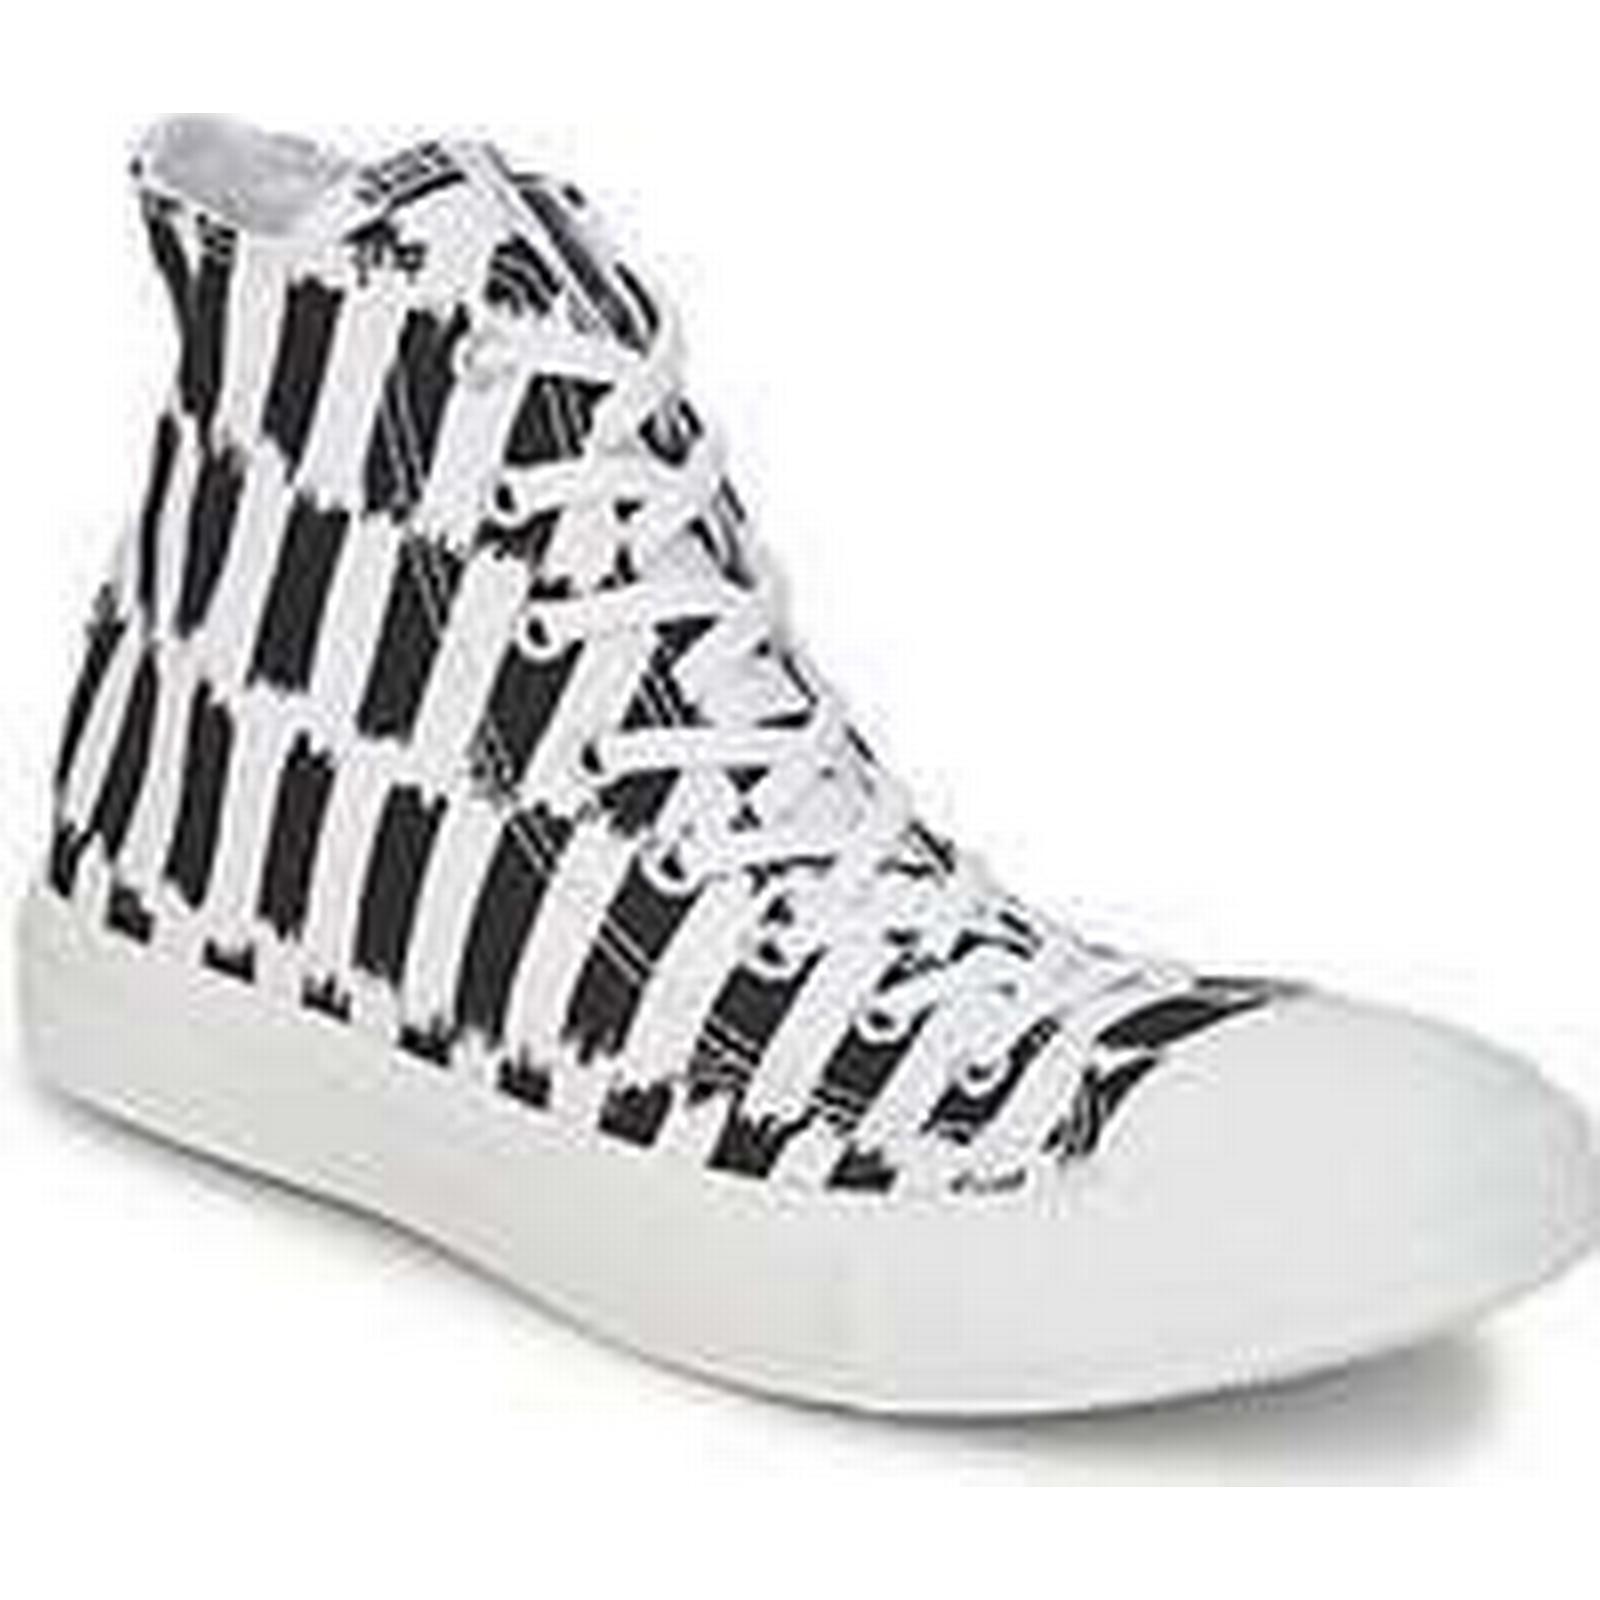 Spartoo.co.uk Converse ALL STAR MARIMEKKO ISHIMOTO HI women's White Shoes (High-top Trainers) in White women's 45948b